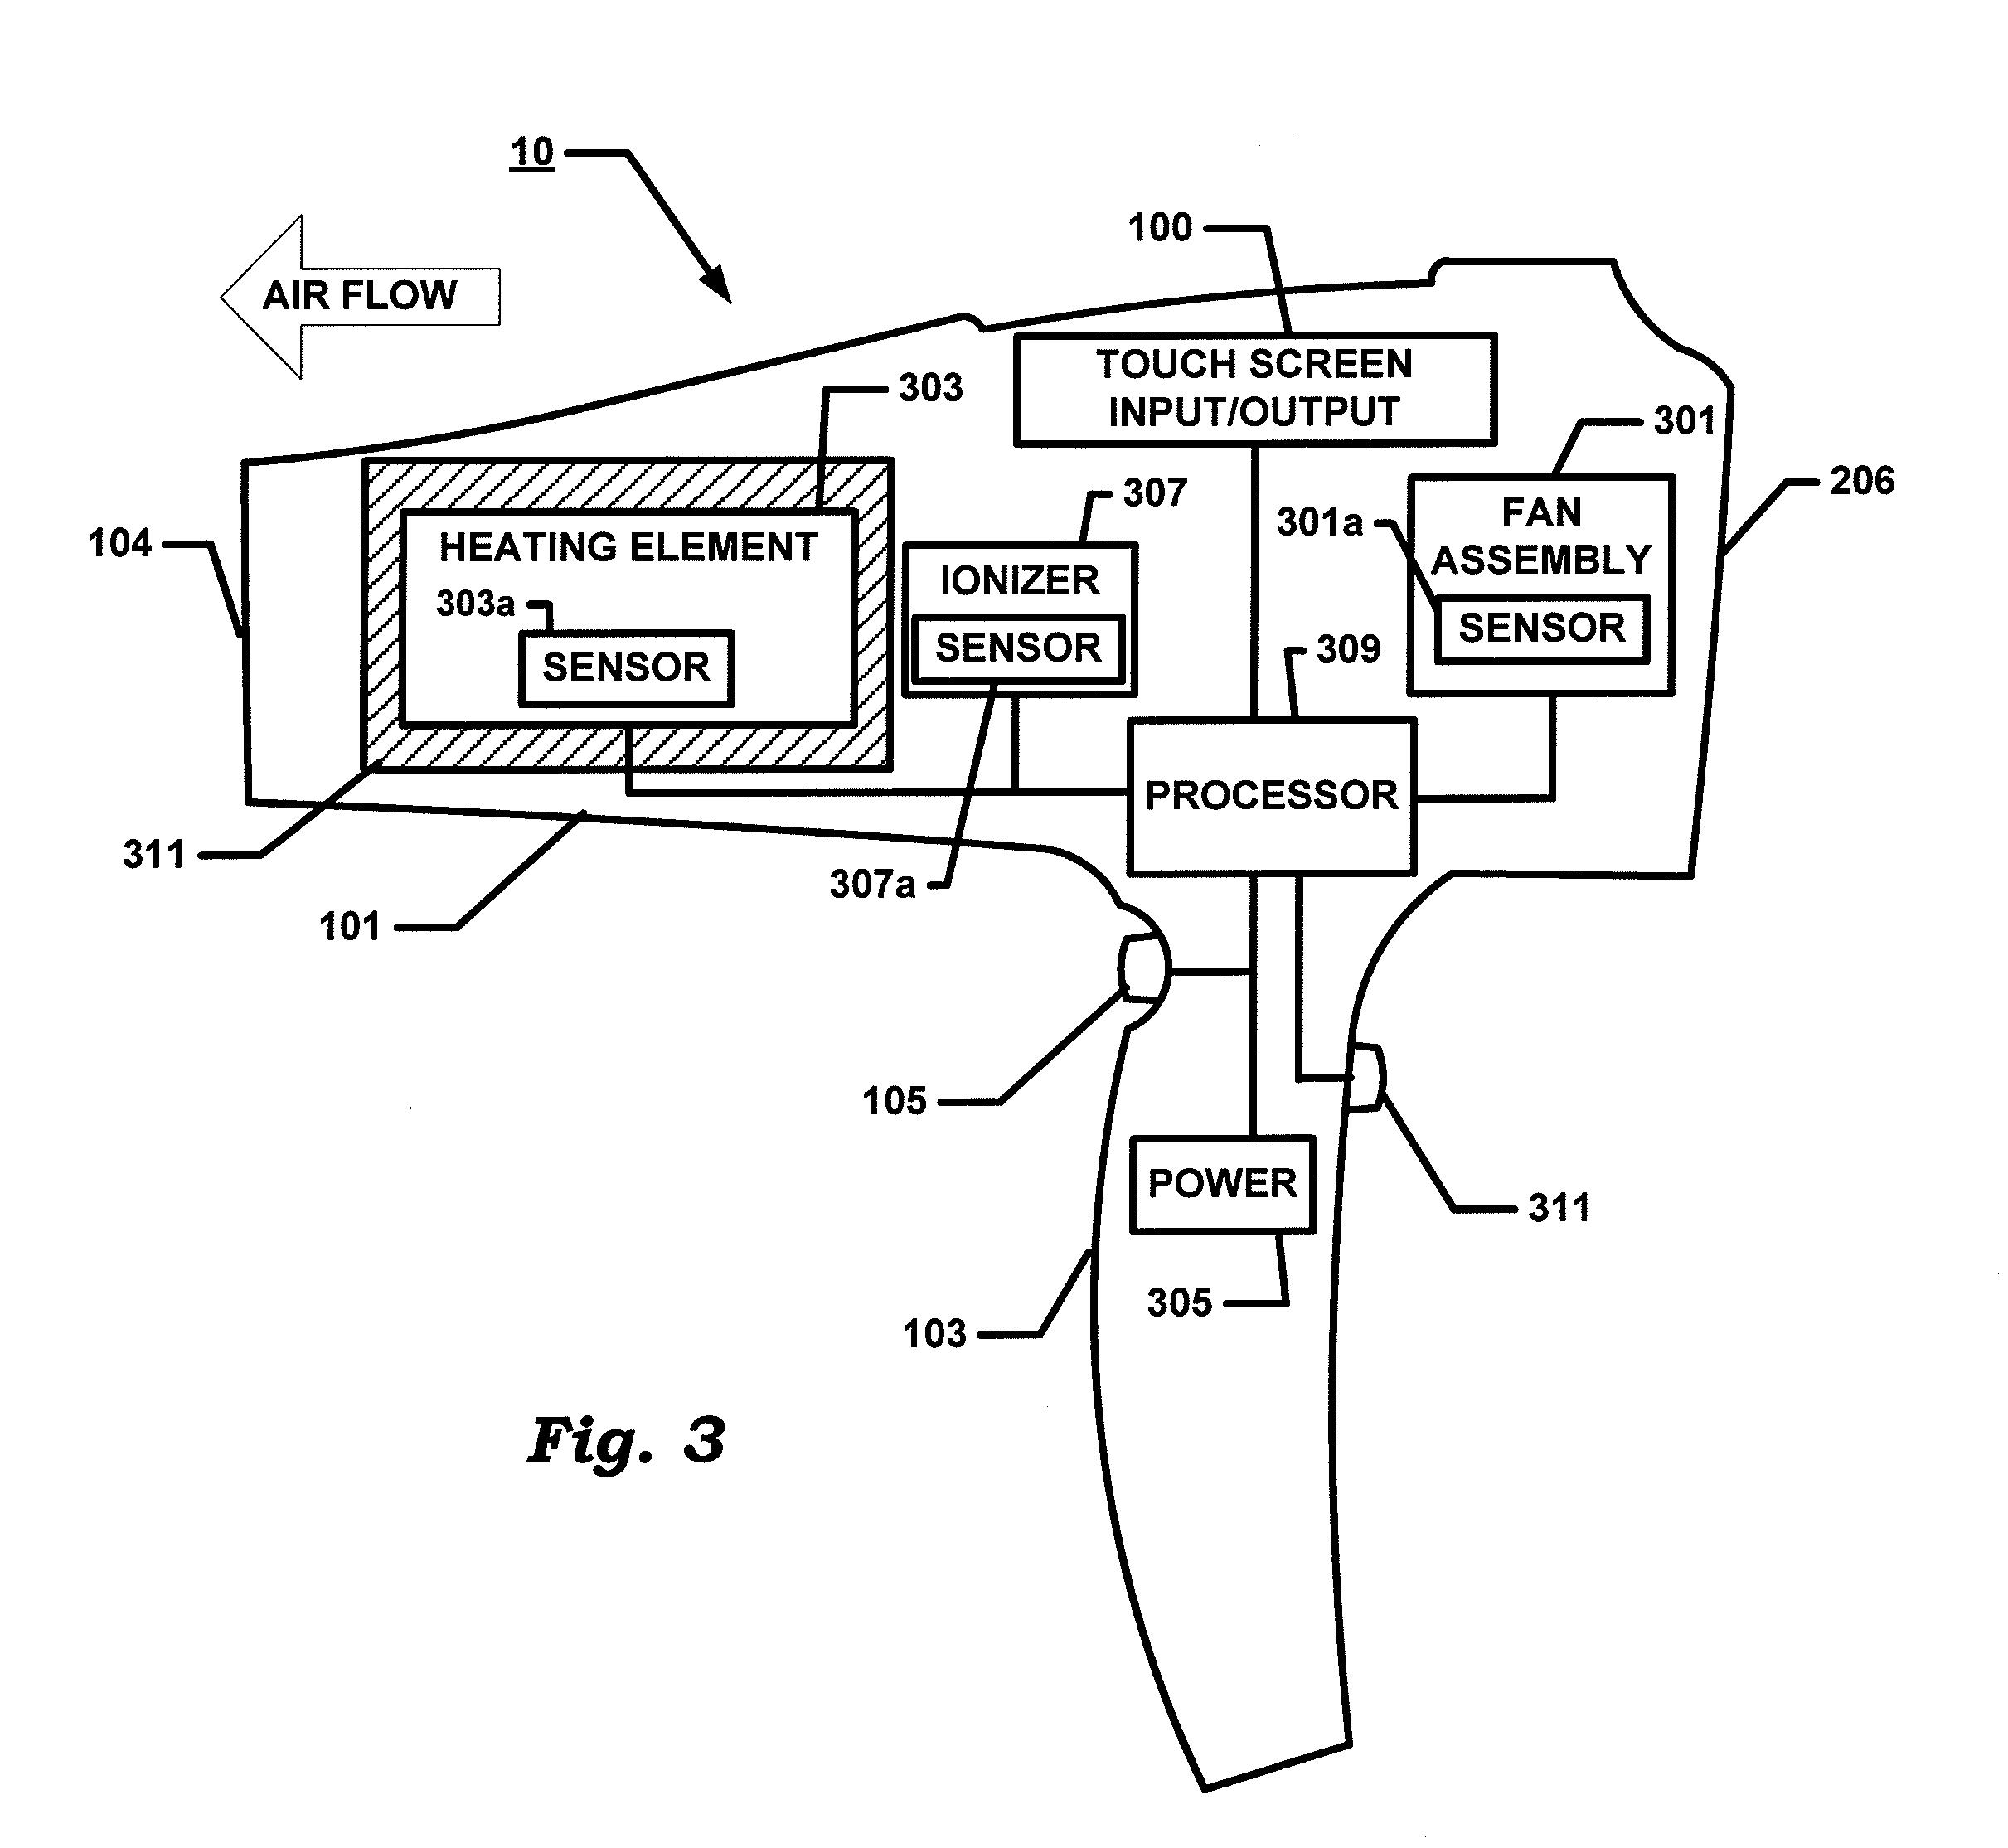 hair dryer diagram   18 wiring diagram images